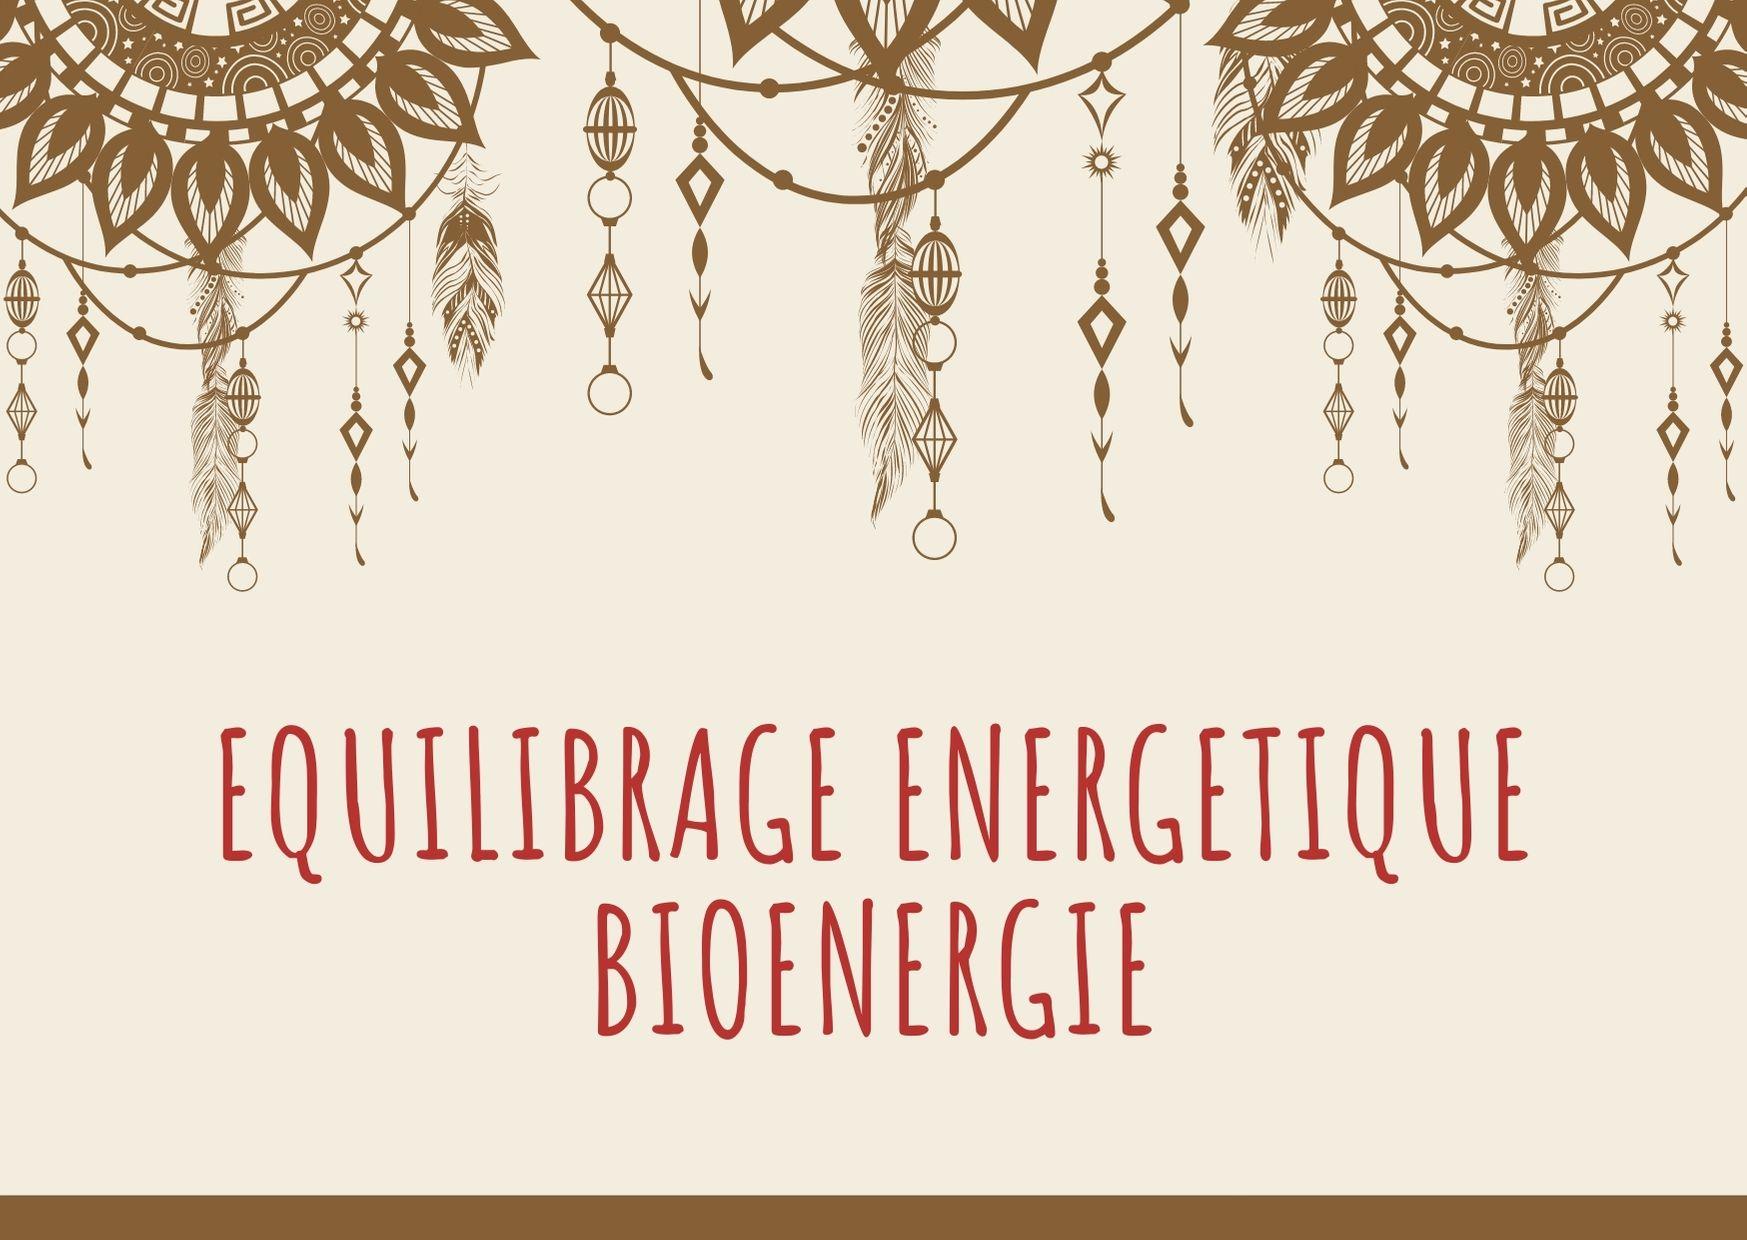 equilibrage-energetique-bioenergie